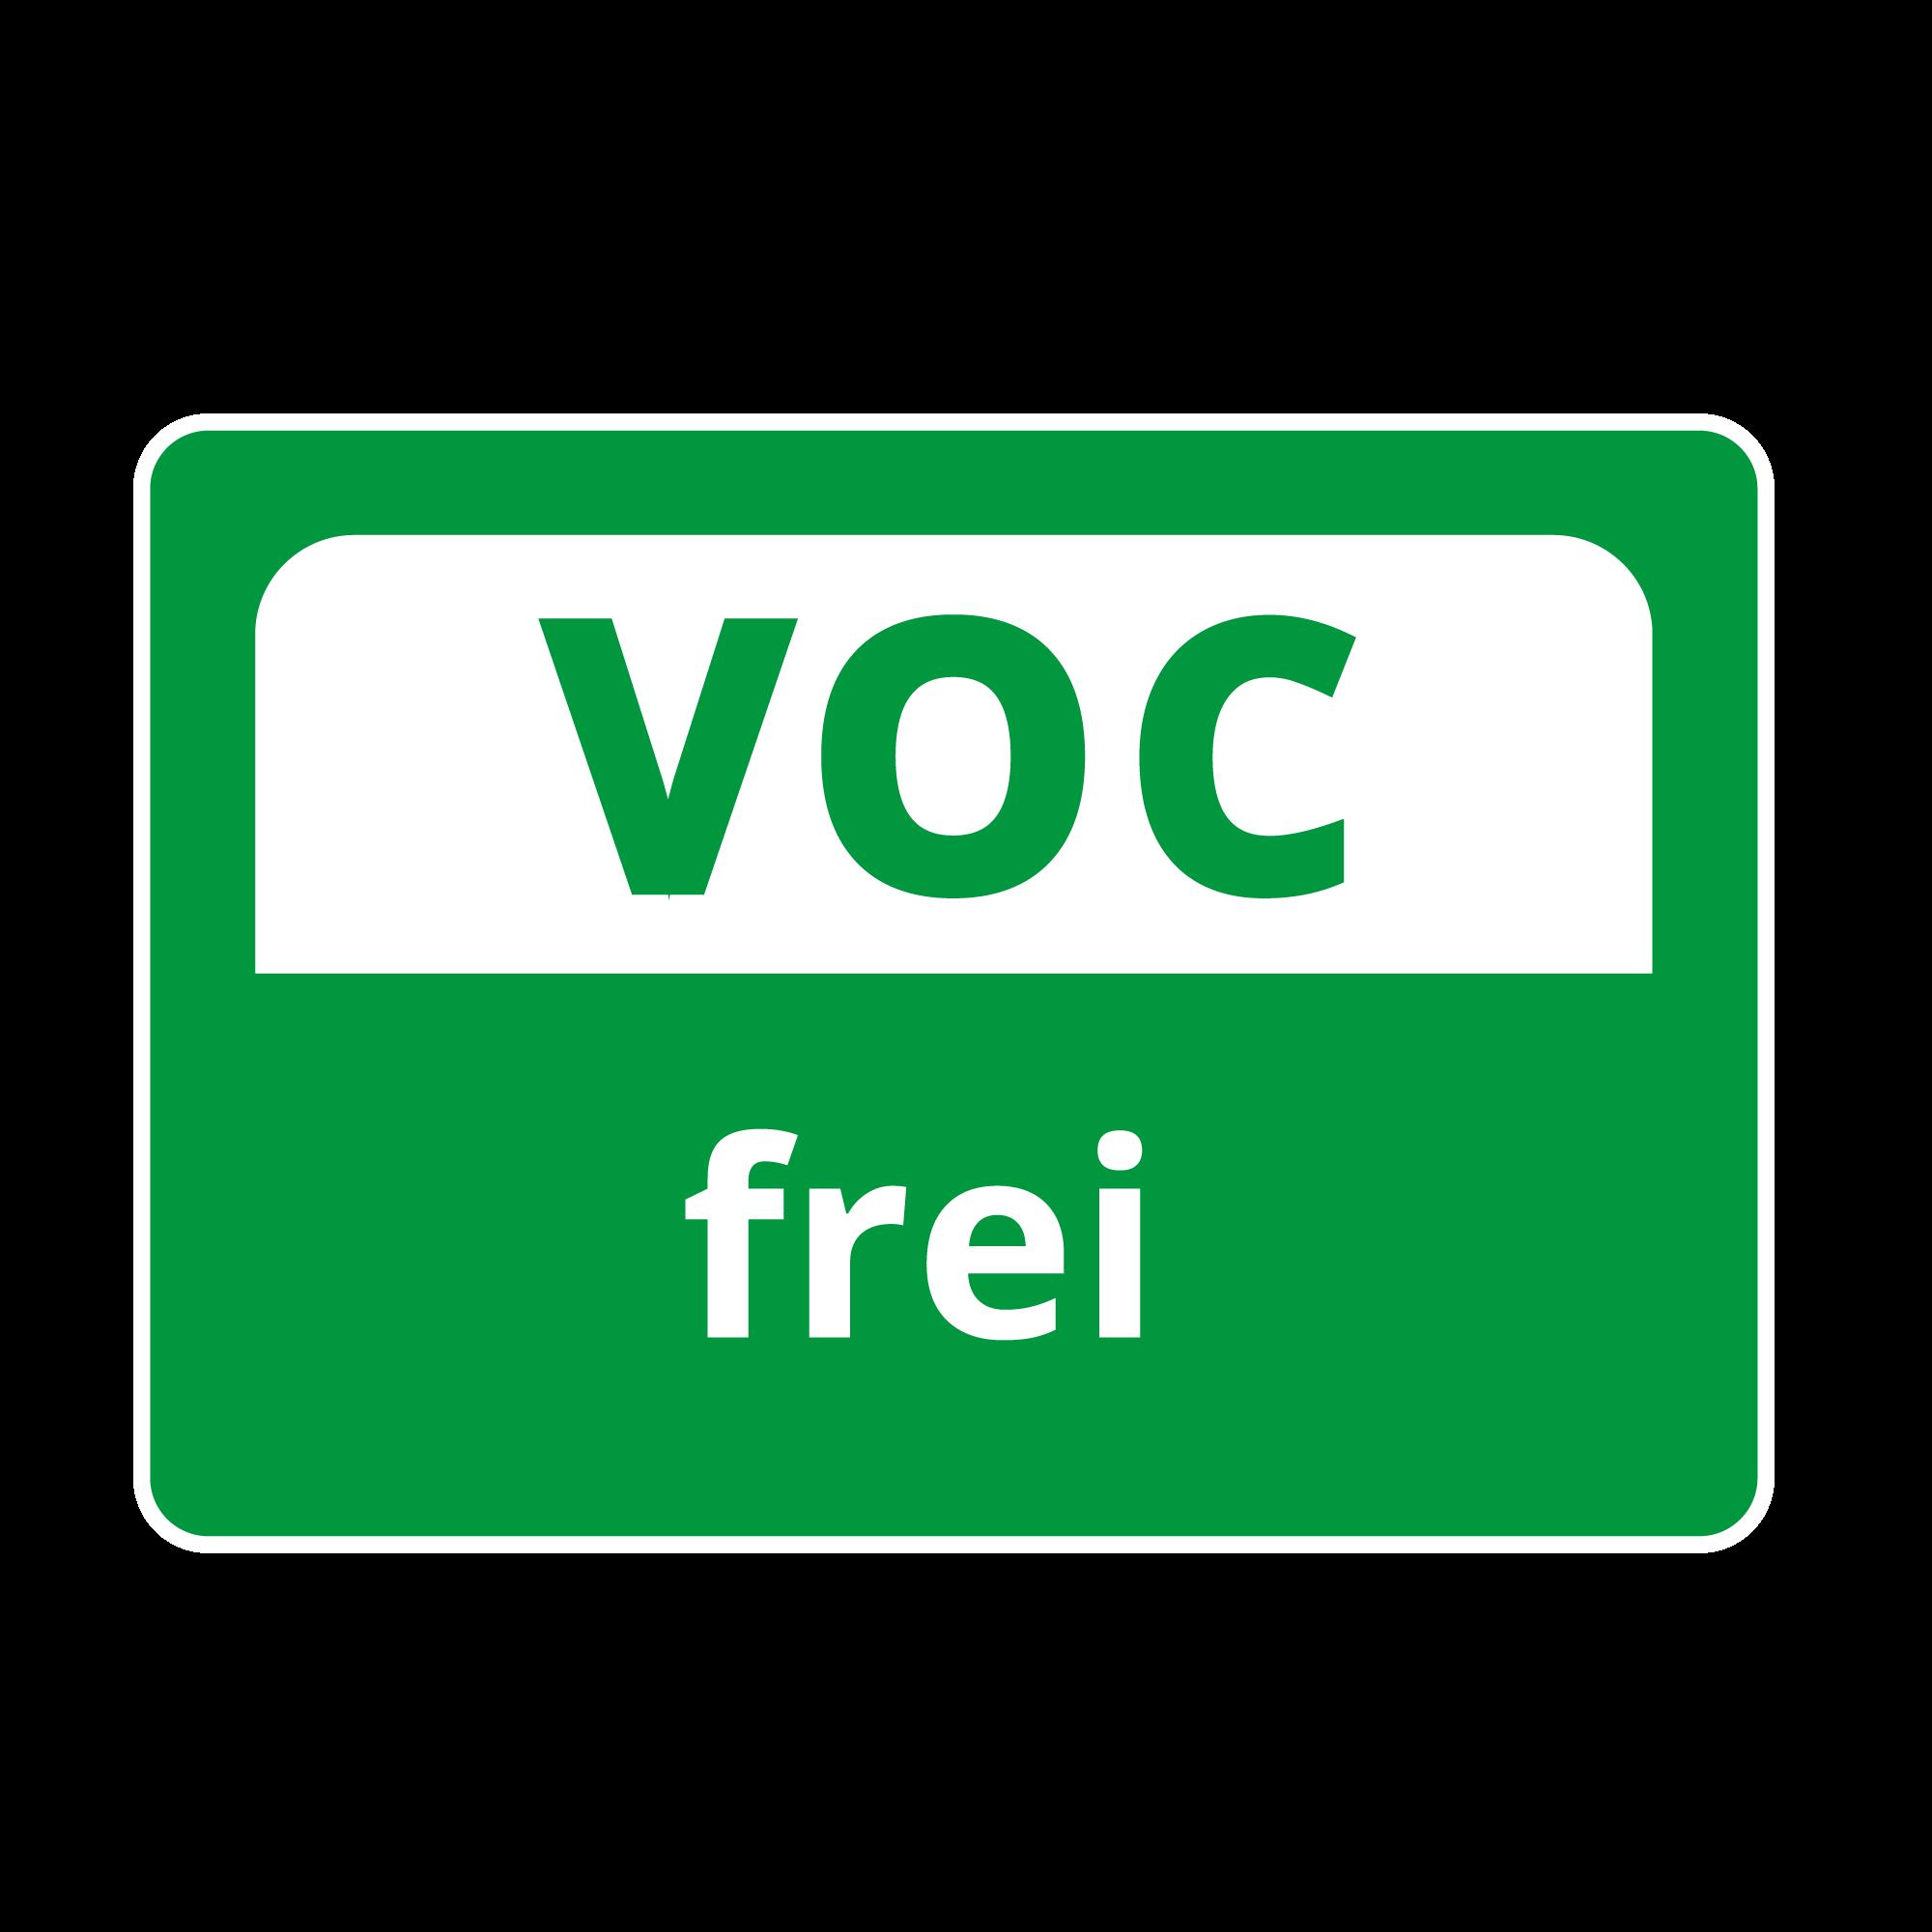 VOC free!